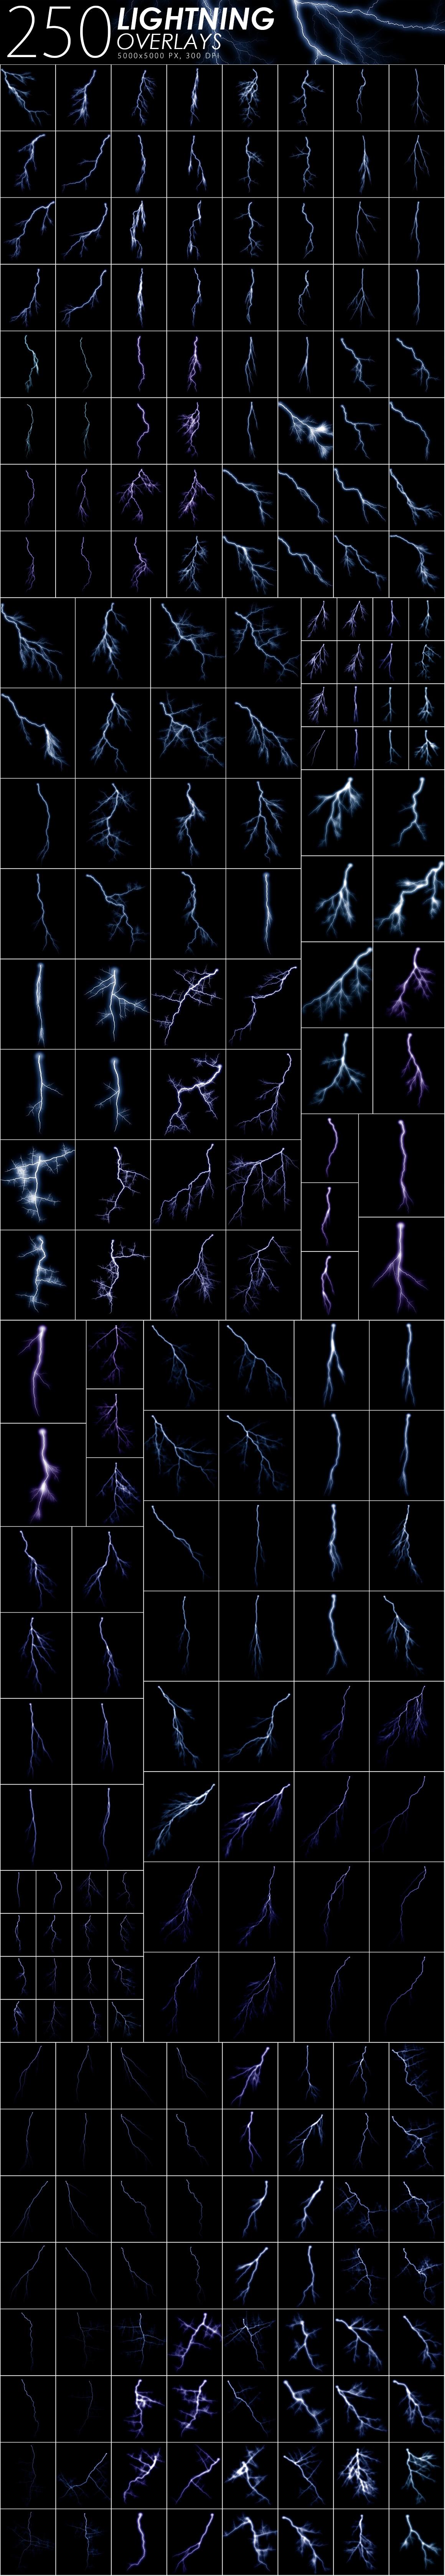 525 Rain, Snow, Lightning Overlays example image 6